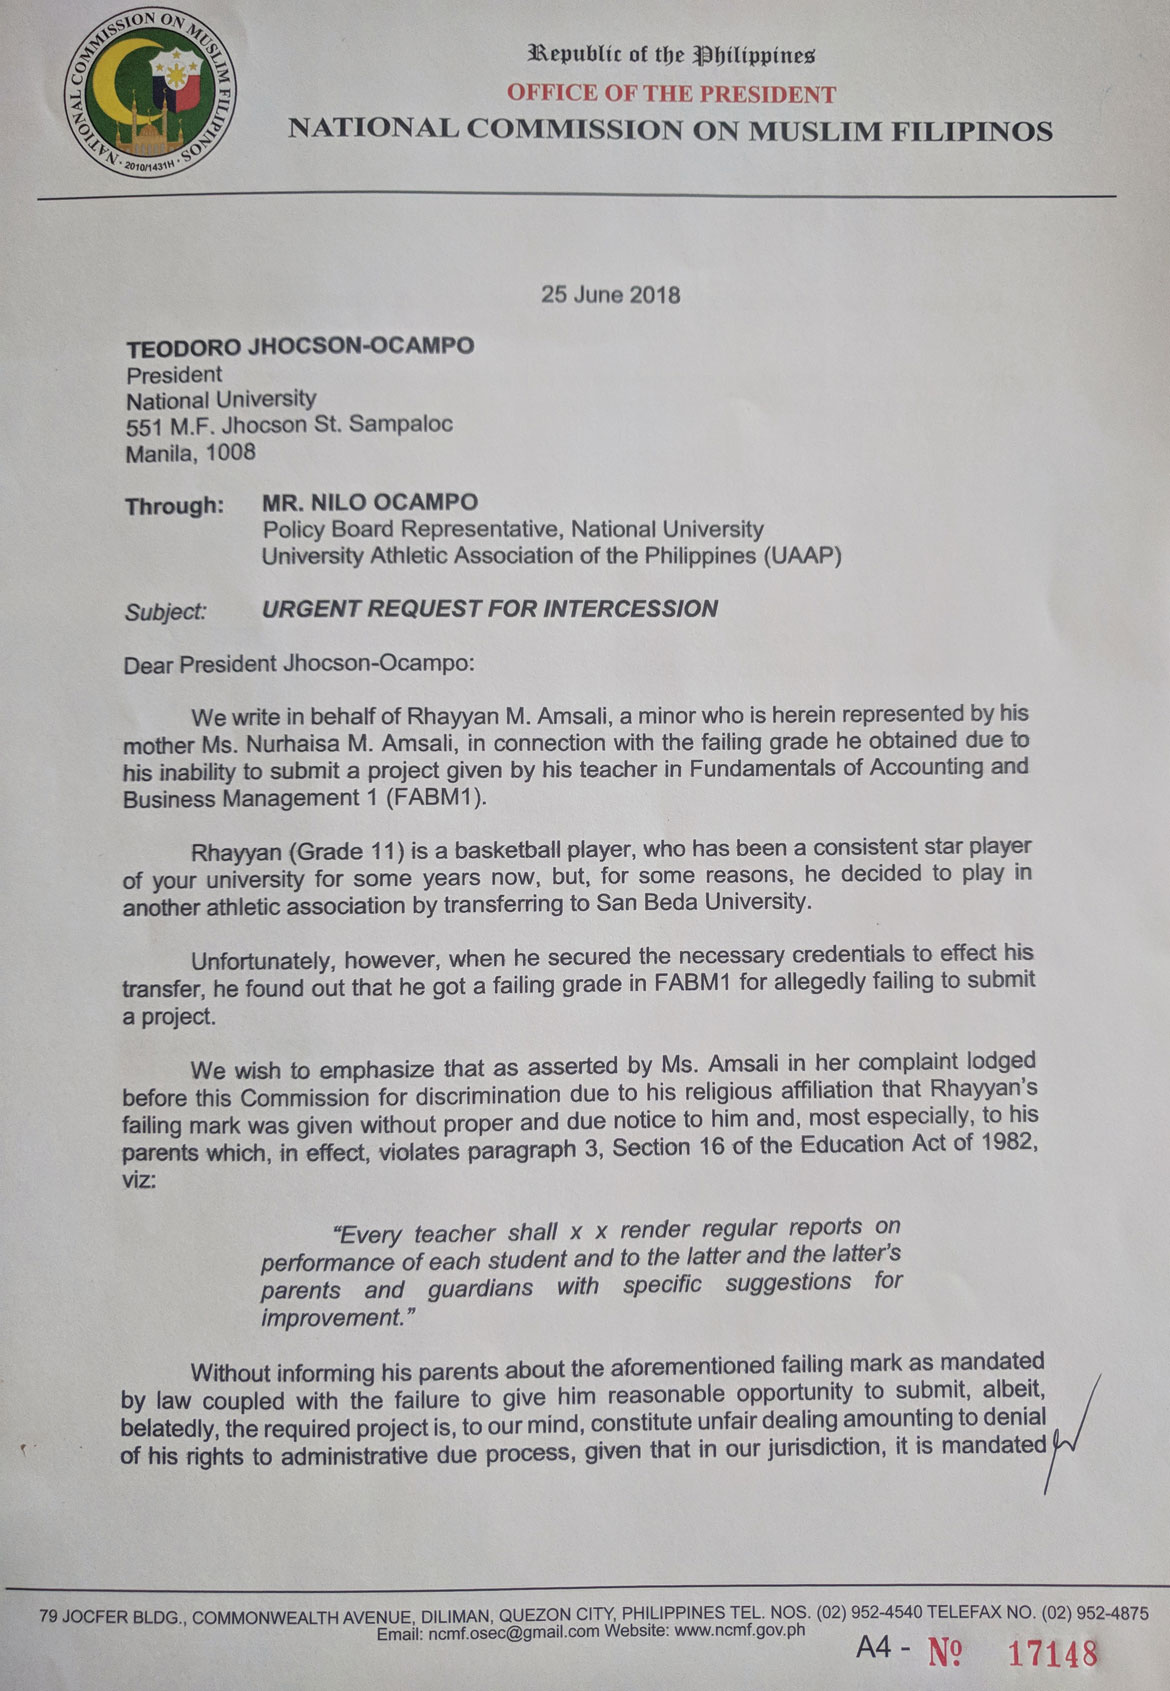 Rhayyan-Amsali-Case-1 Rhayyan Amsali files complaint against NS-NU Basketball News NU SBC  - philippine sports news